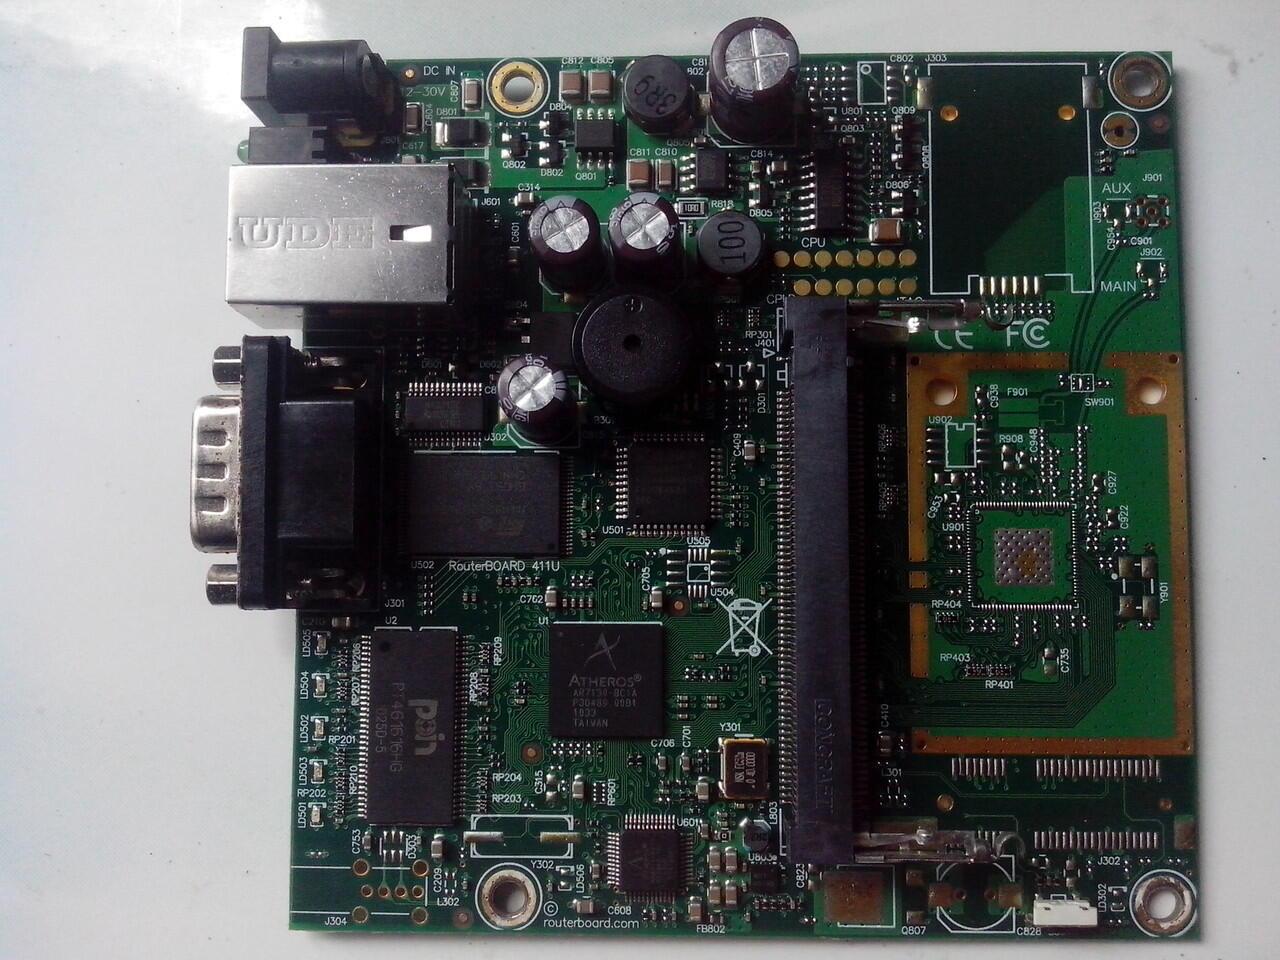 Mikrotik Outdoor RB411 + R52H Atheros Wireless MiniPCI 350mWatt ABG + Wistron CM9-GP